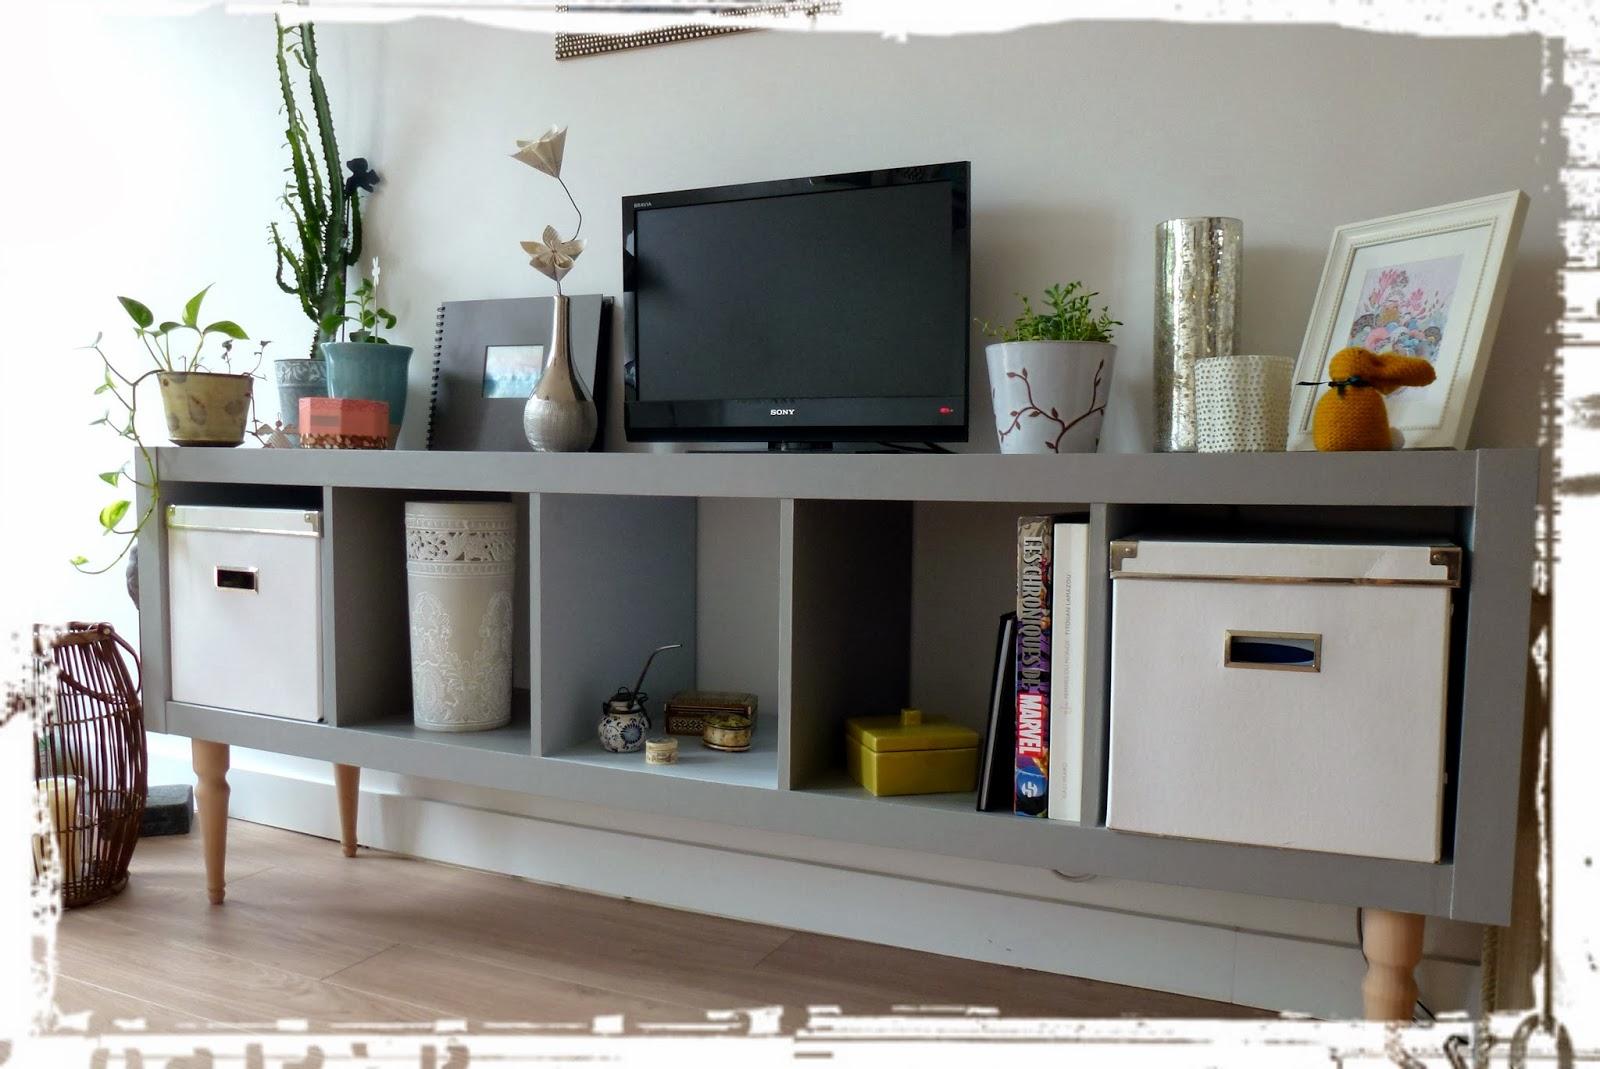 Meuble Tv Kallax : Meuble Tv Ikea Expedit Meuble Expedit Modulable Ikea